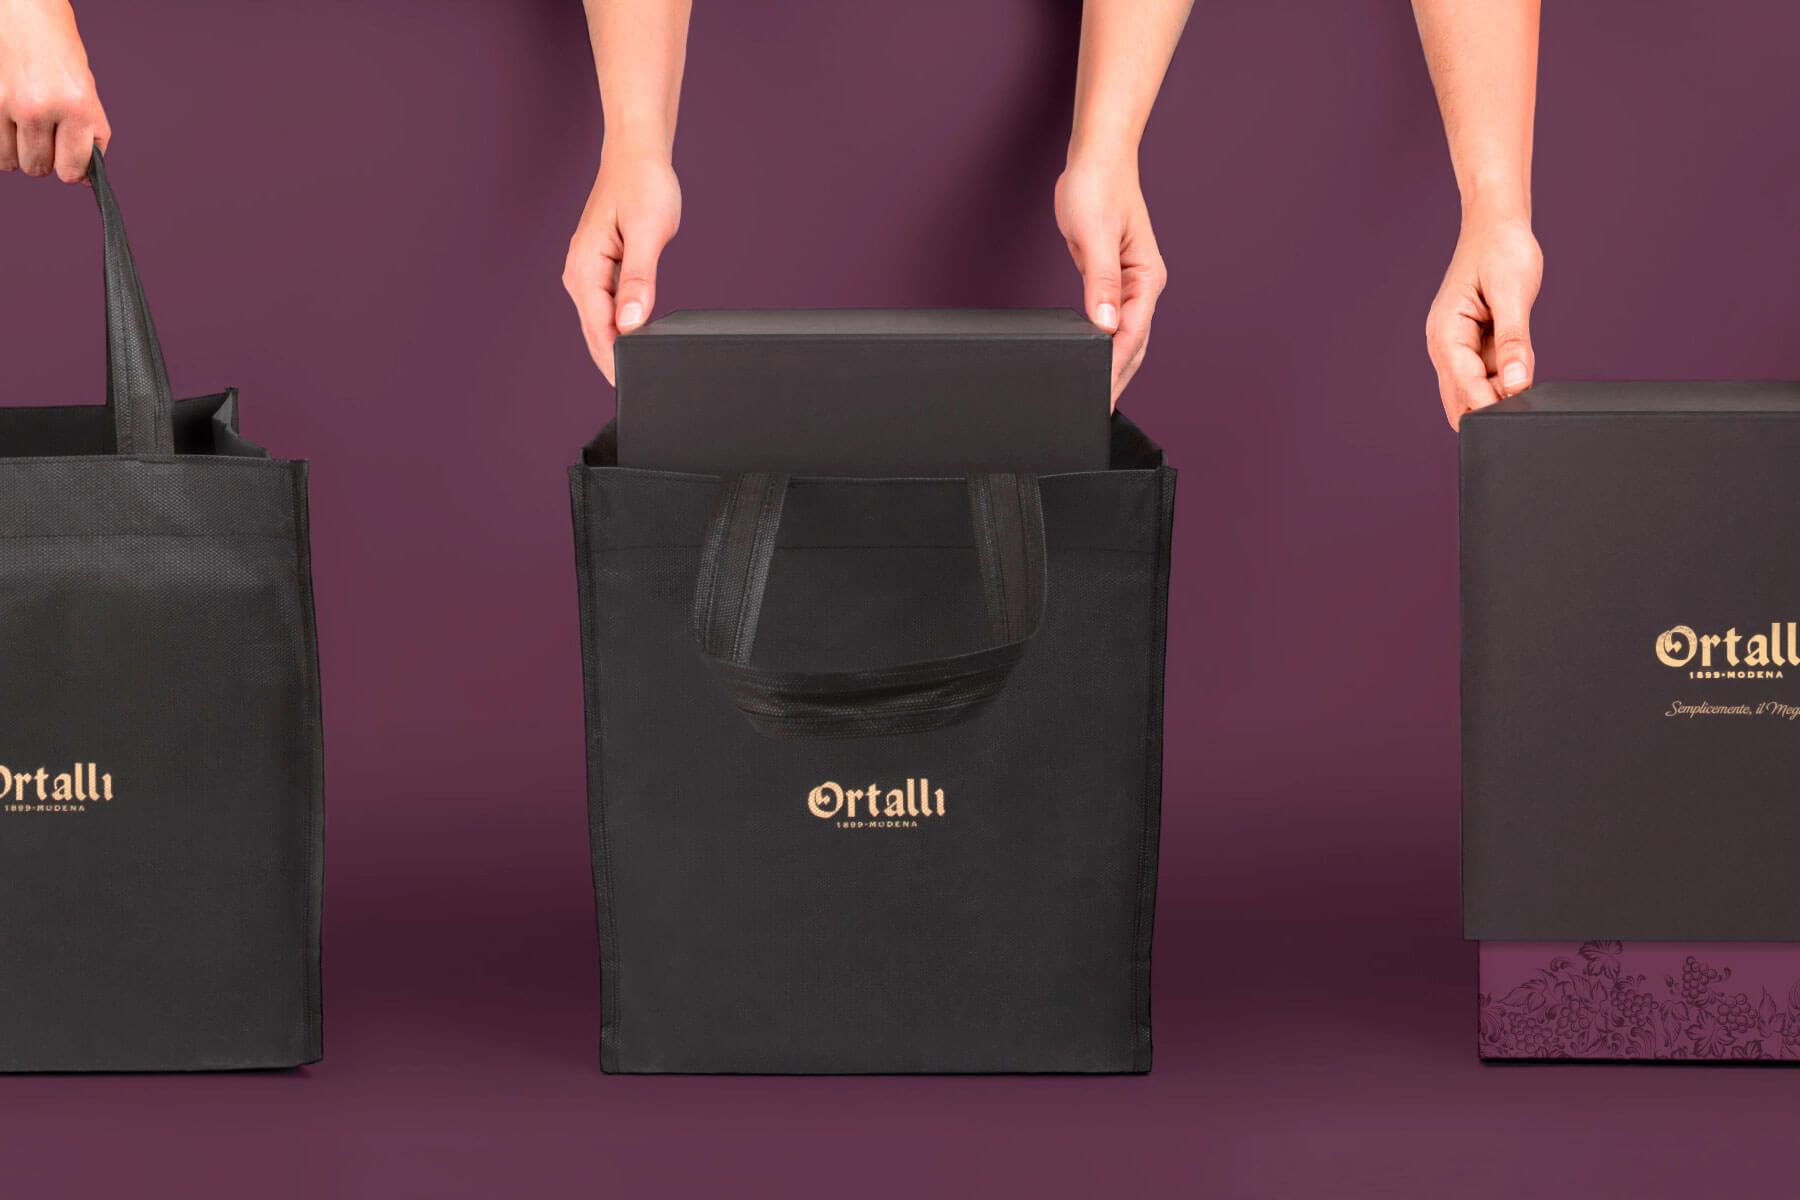 Unboxing del selling kit de Ortalli